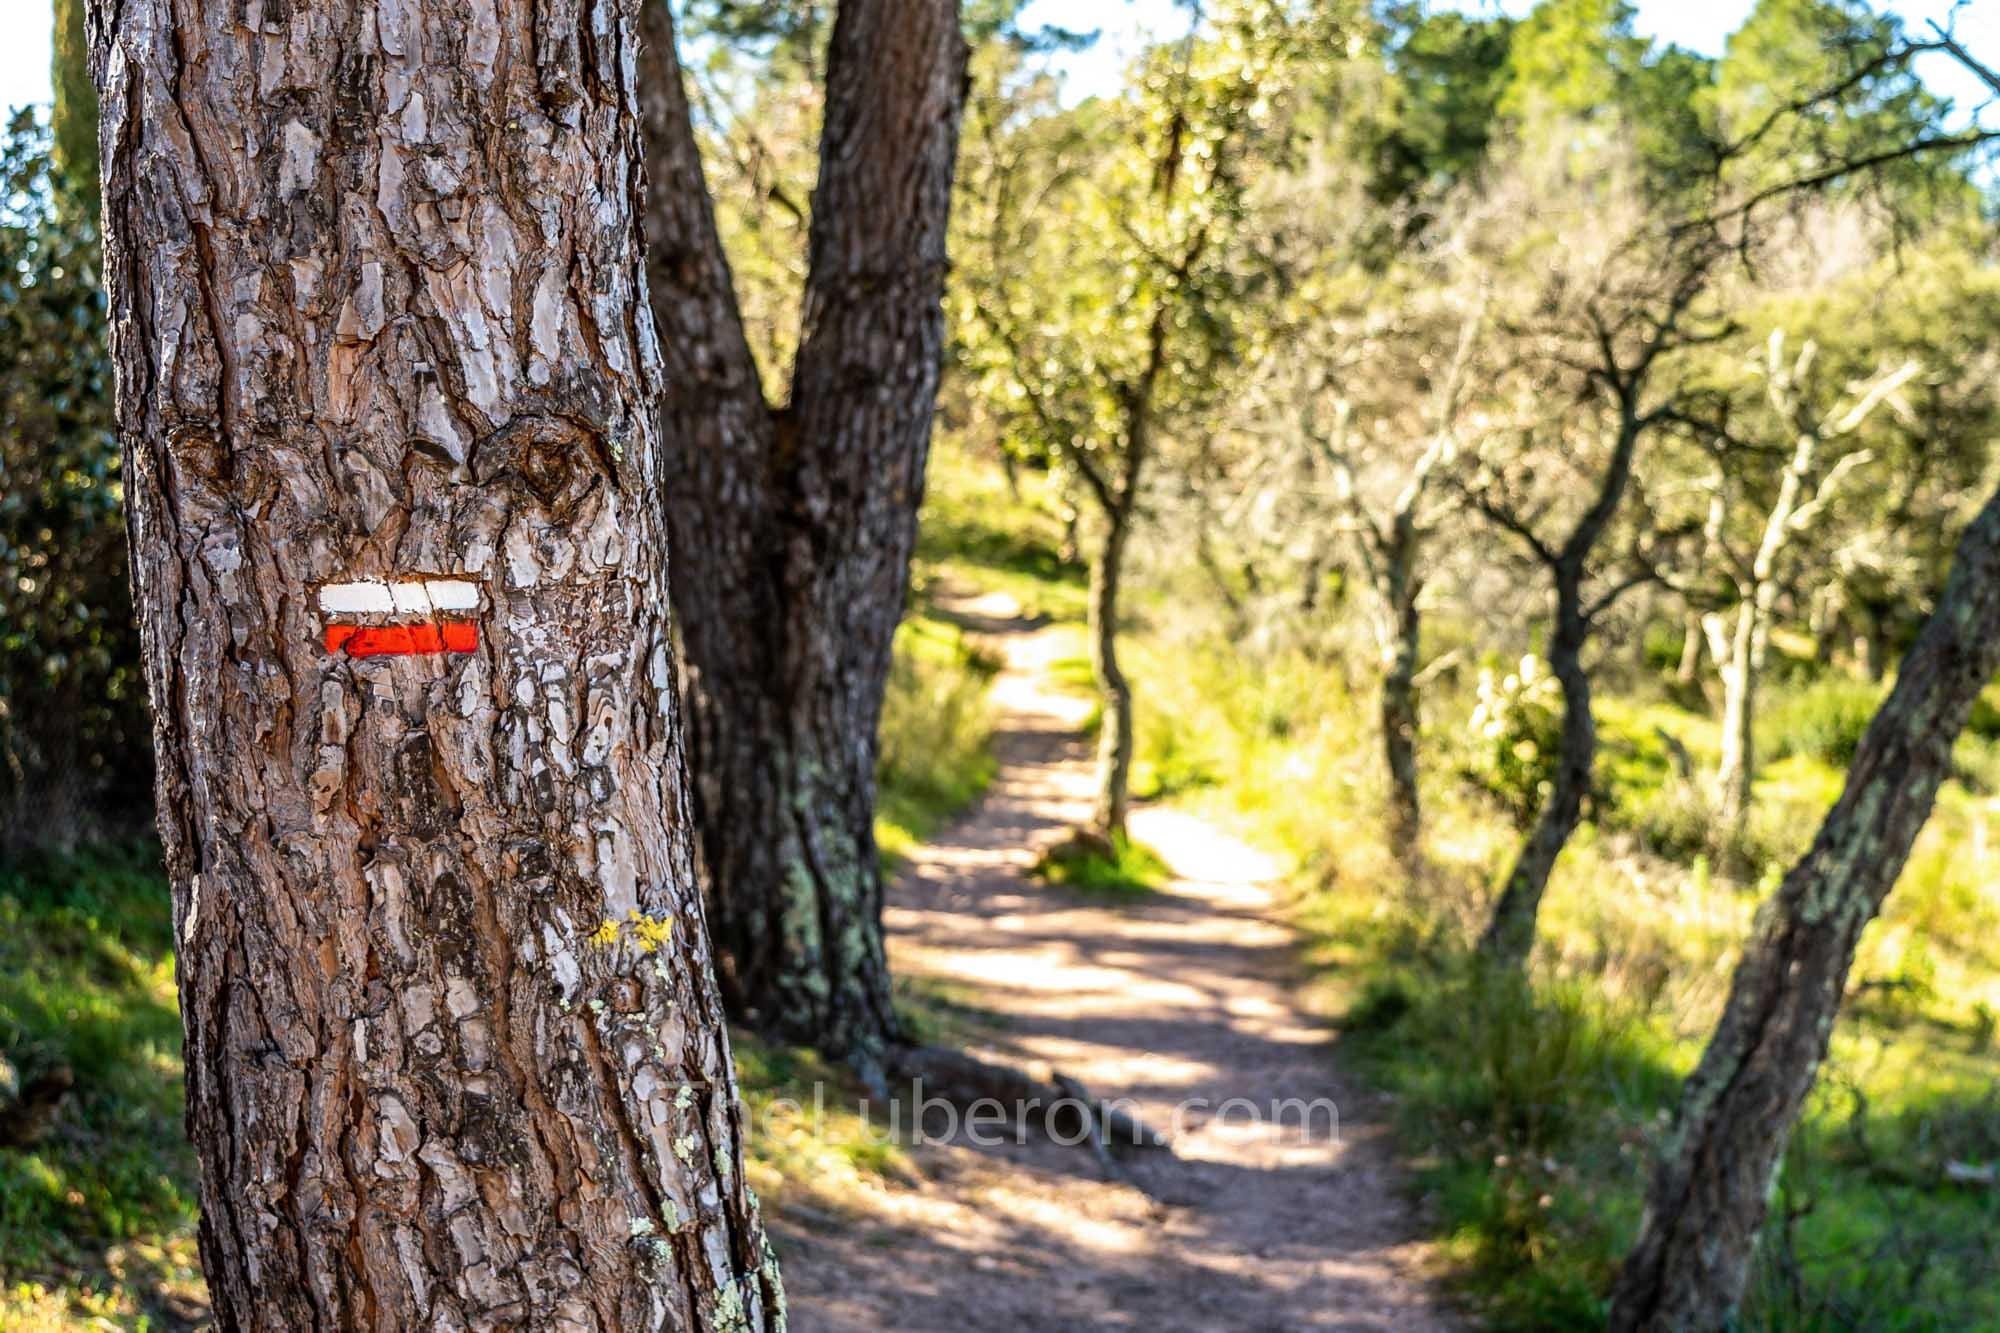 Sign on tree for a Grande Randonnée